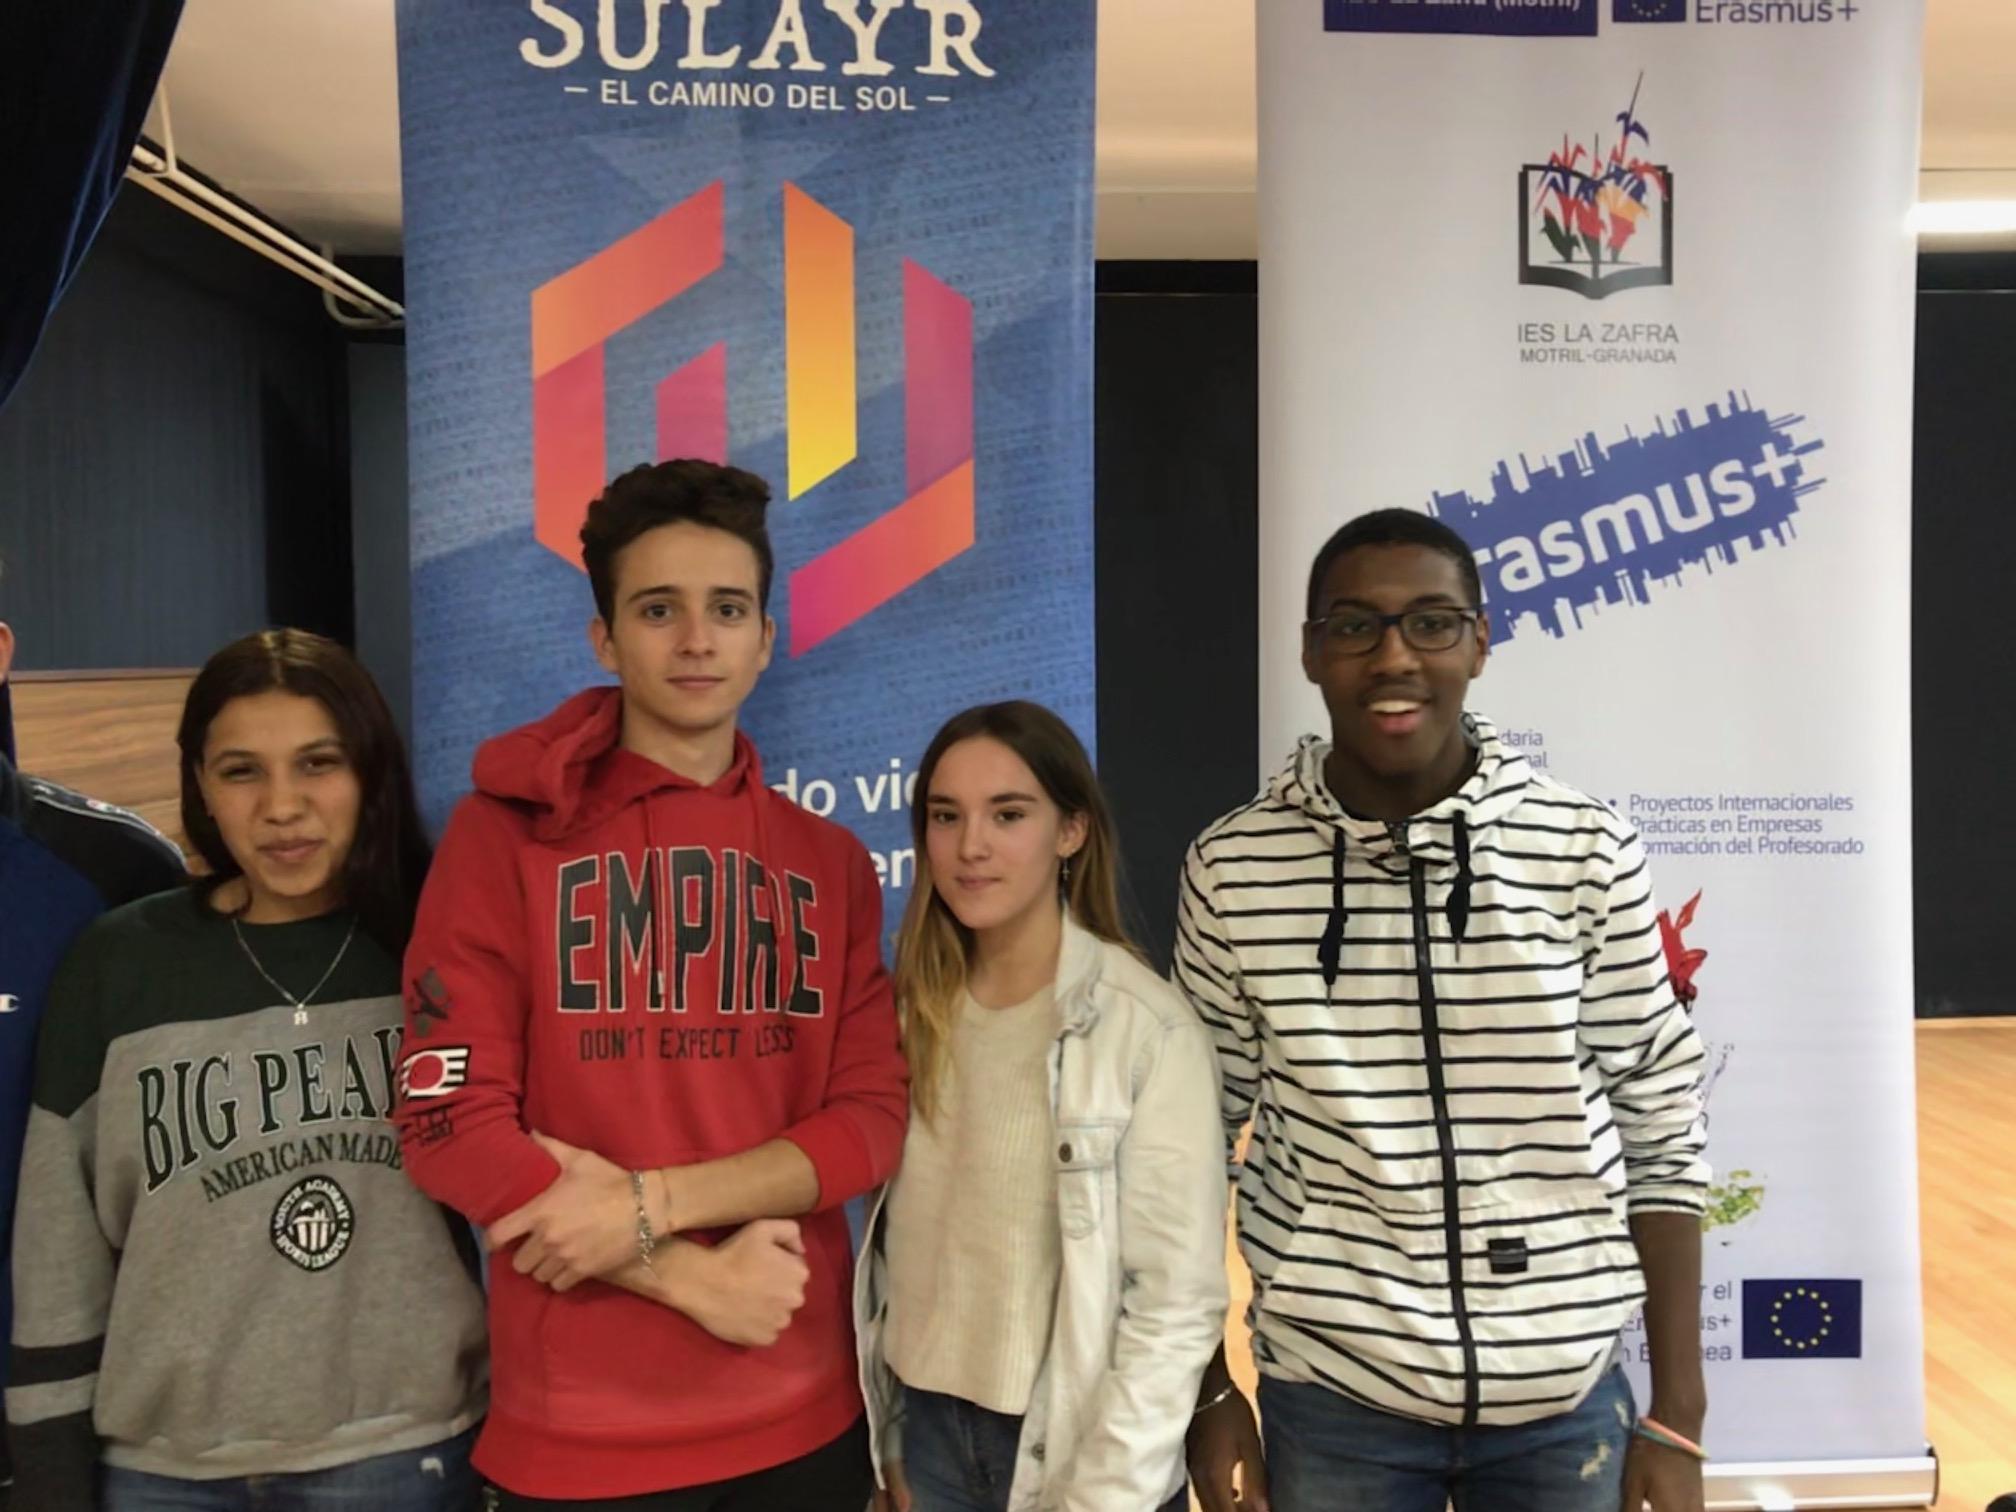 Proyecto ERASMUS+ SULAYR